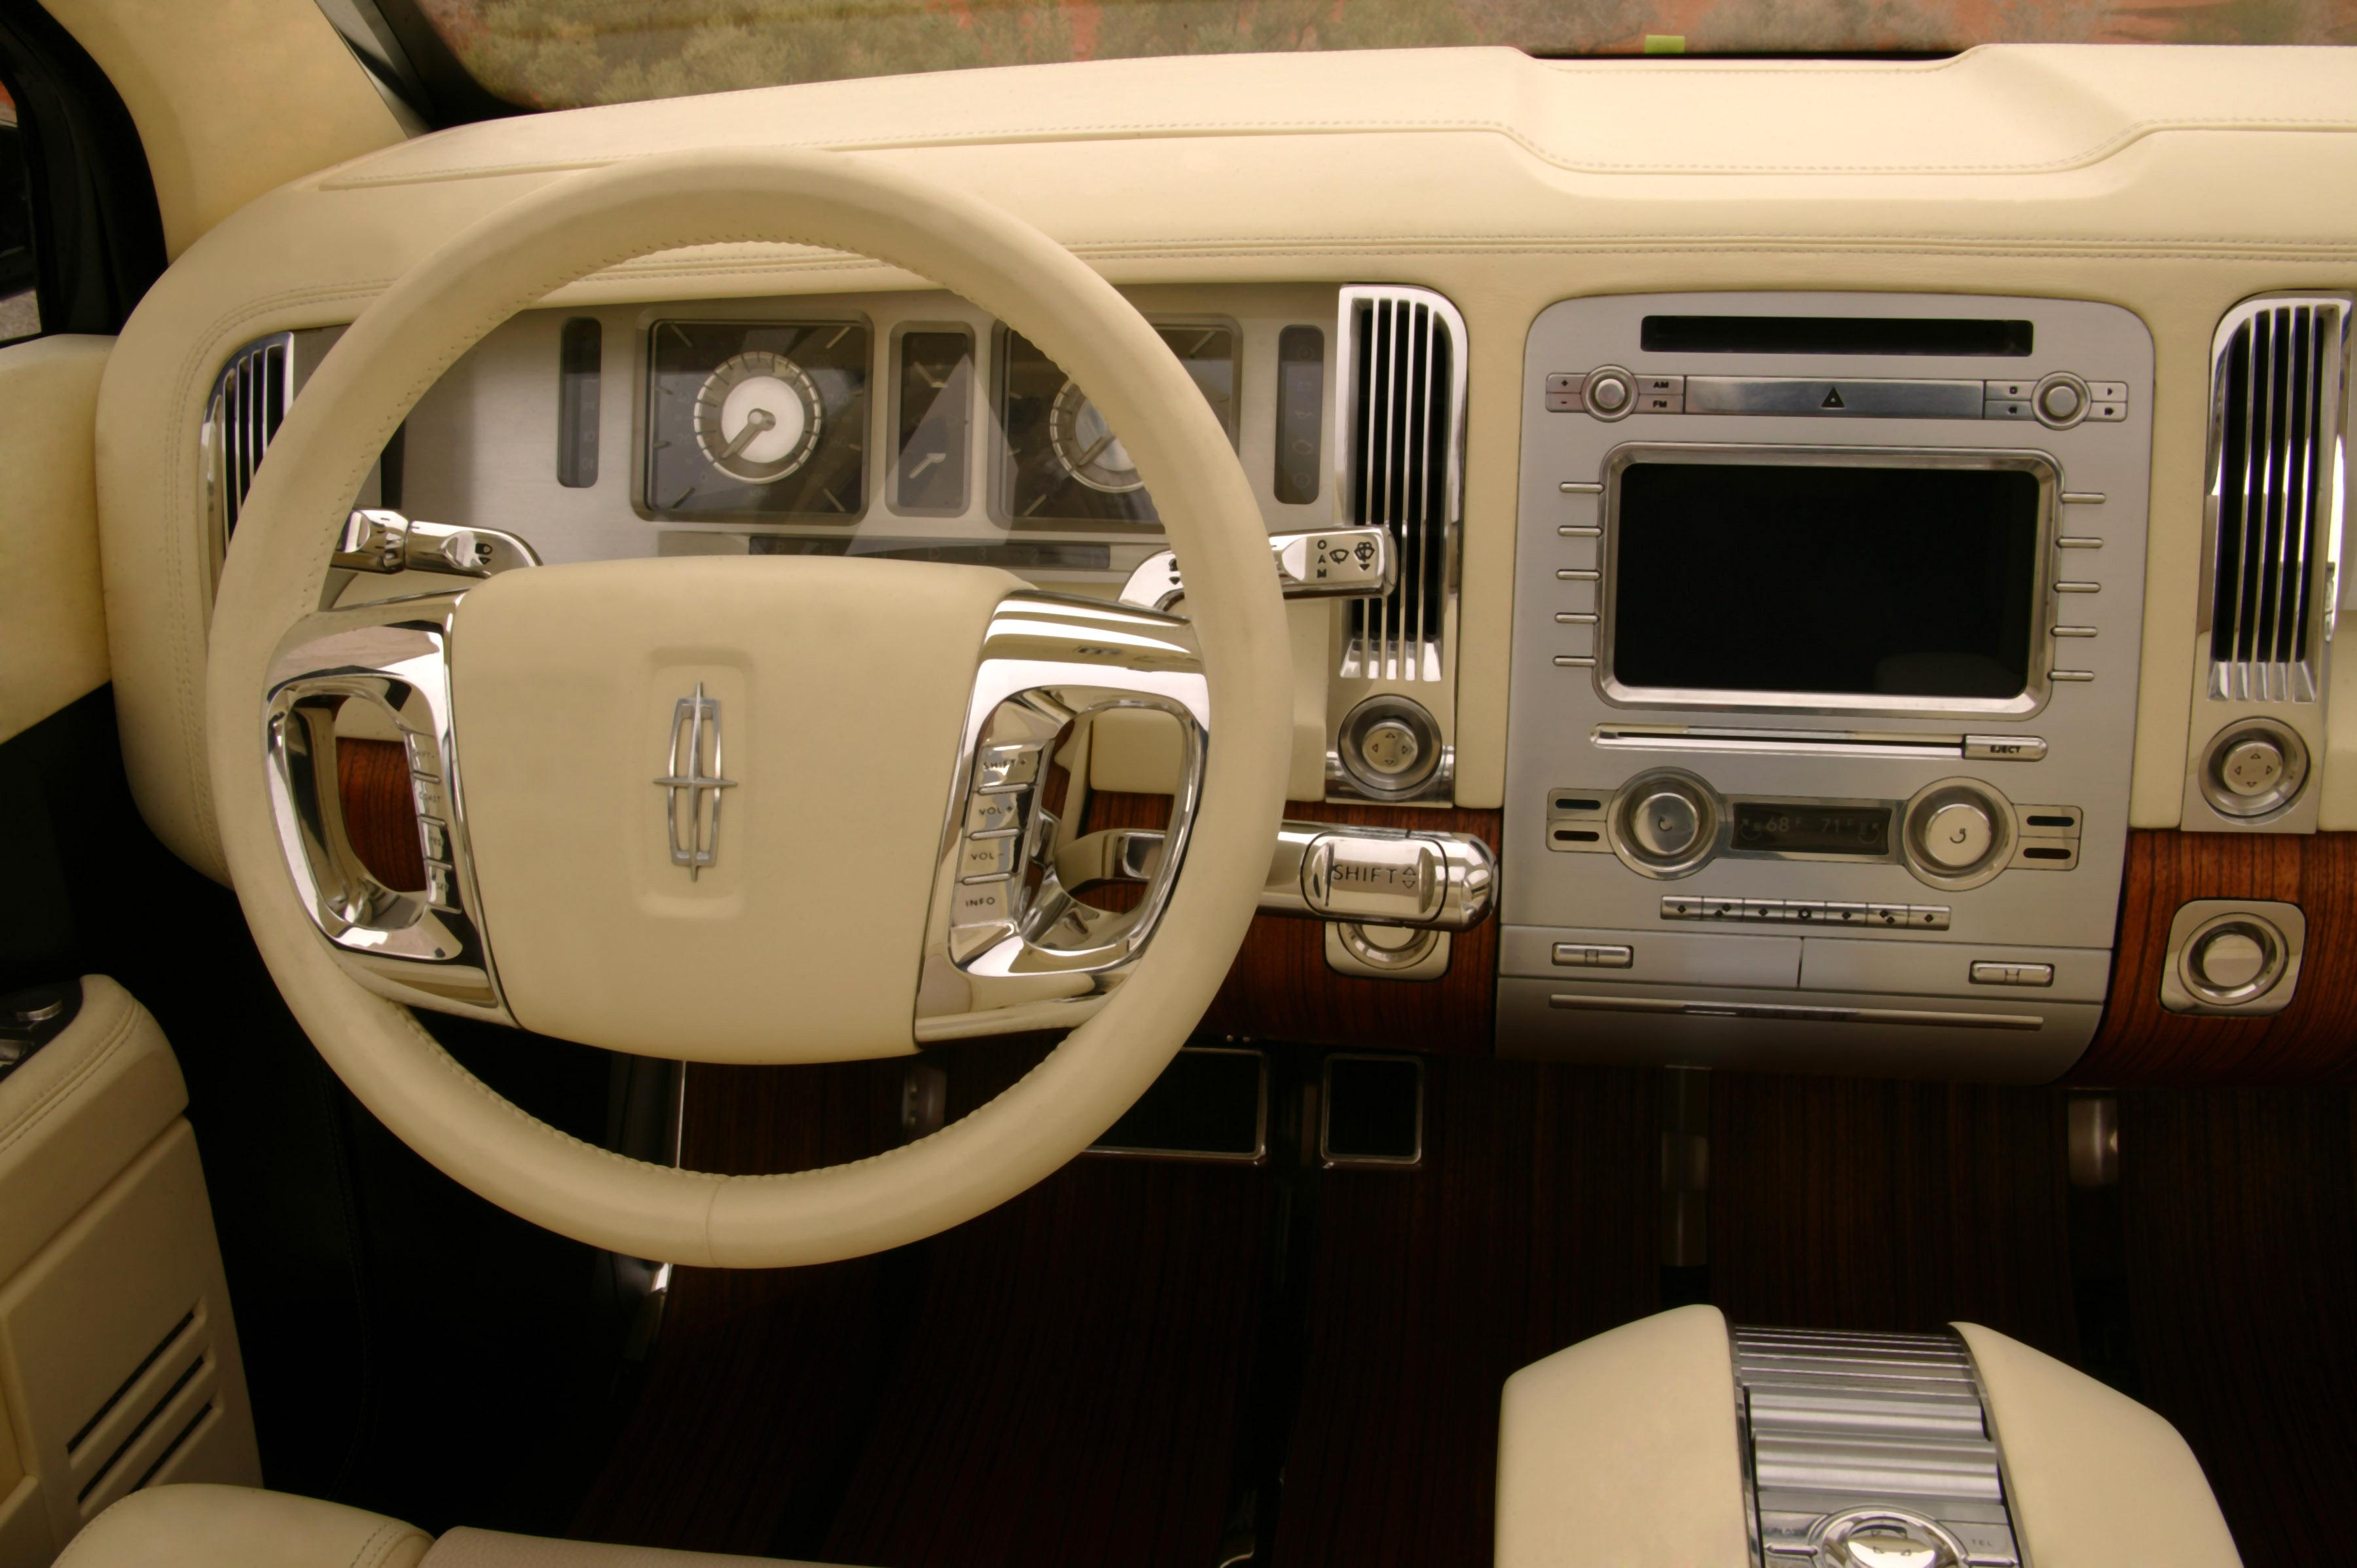 https://www.automobilesreview.com/gallery/lincoln-aviator-next-generation-concept/lincoln-aviator-concept-14.jpg